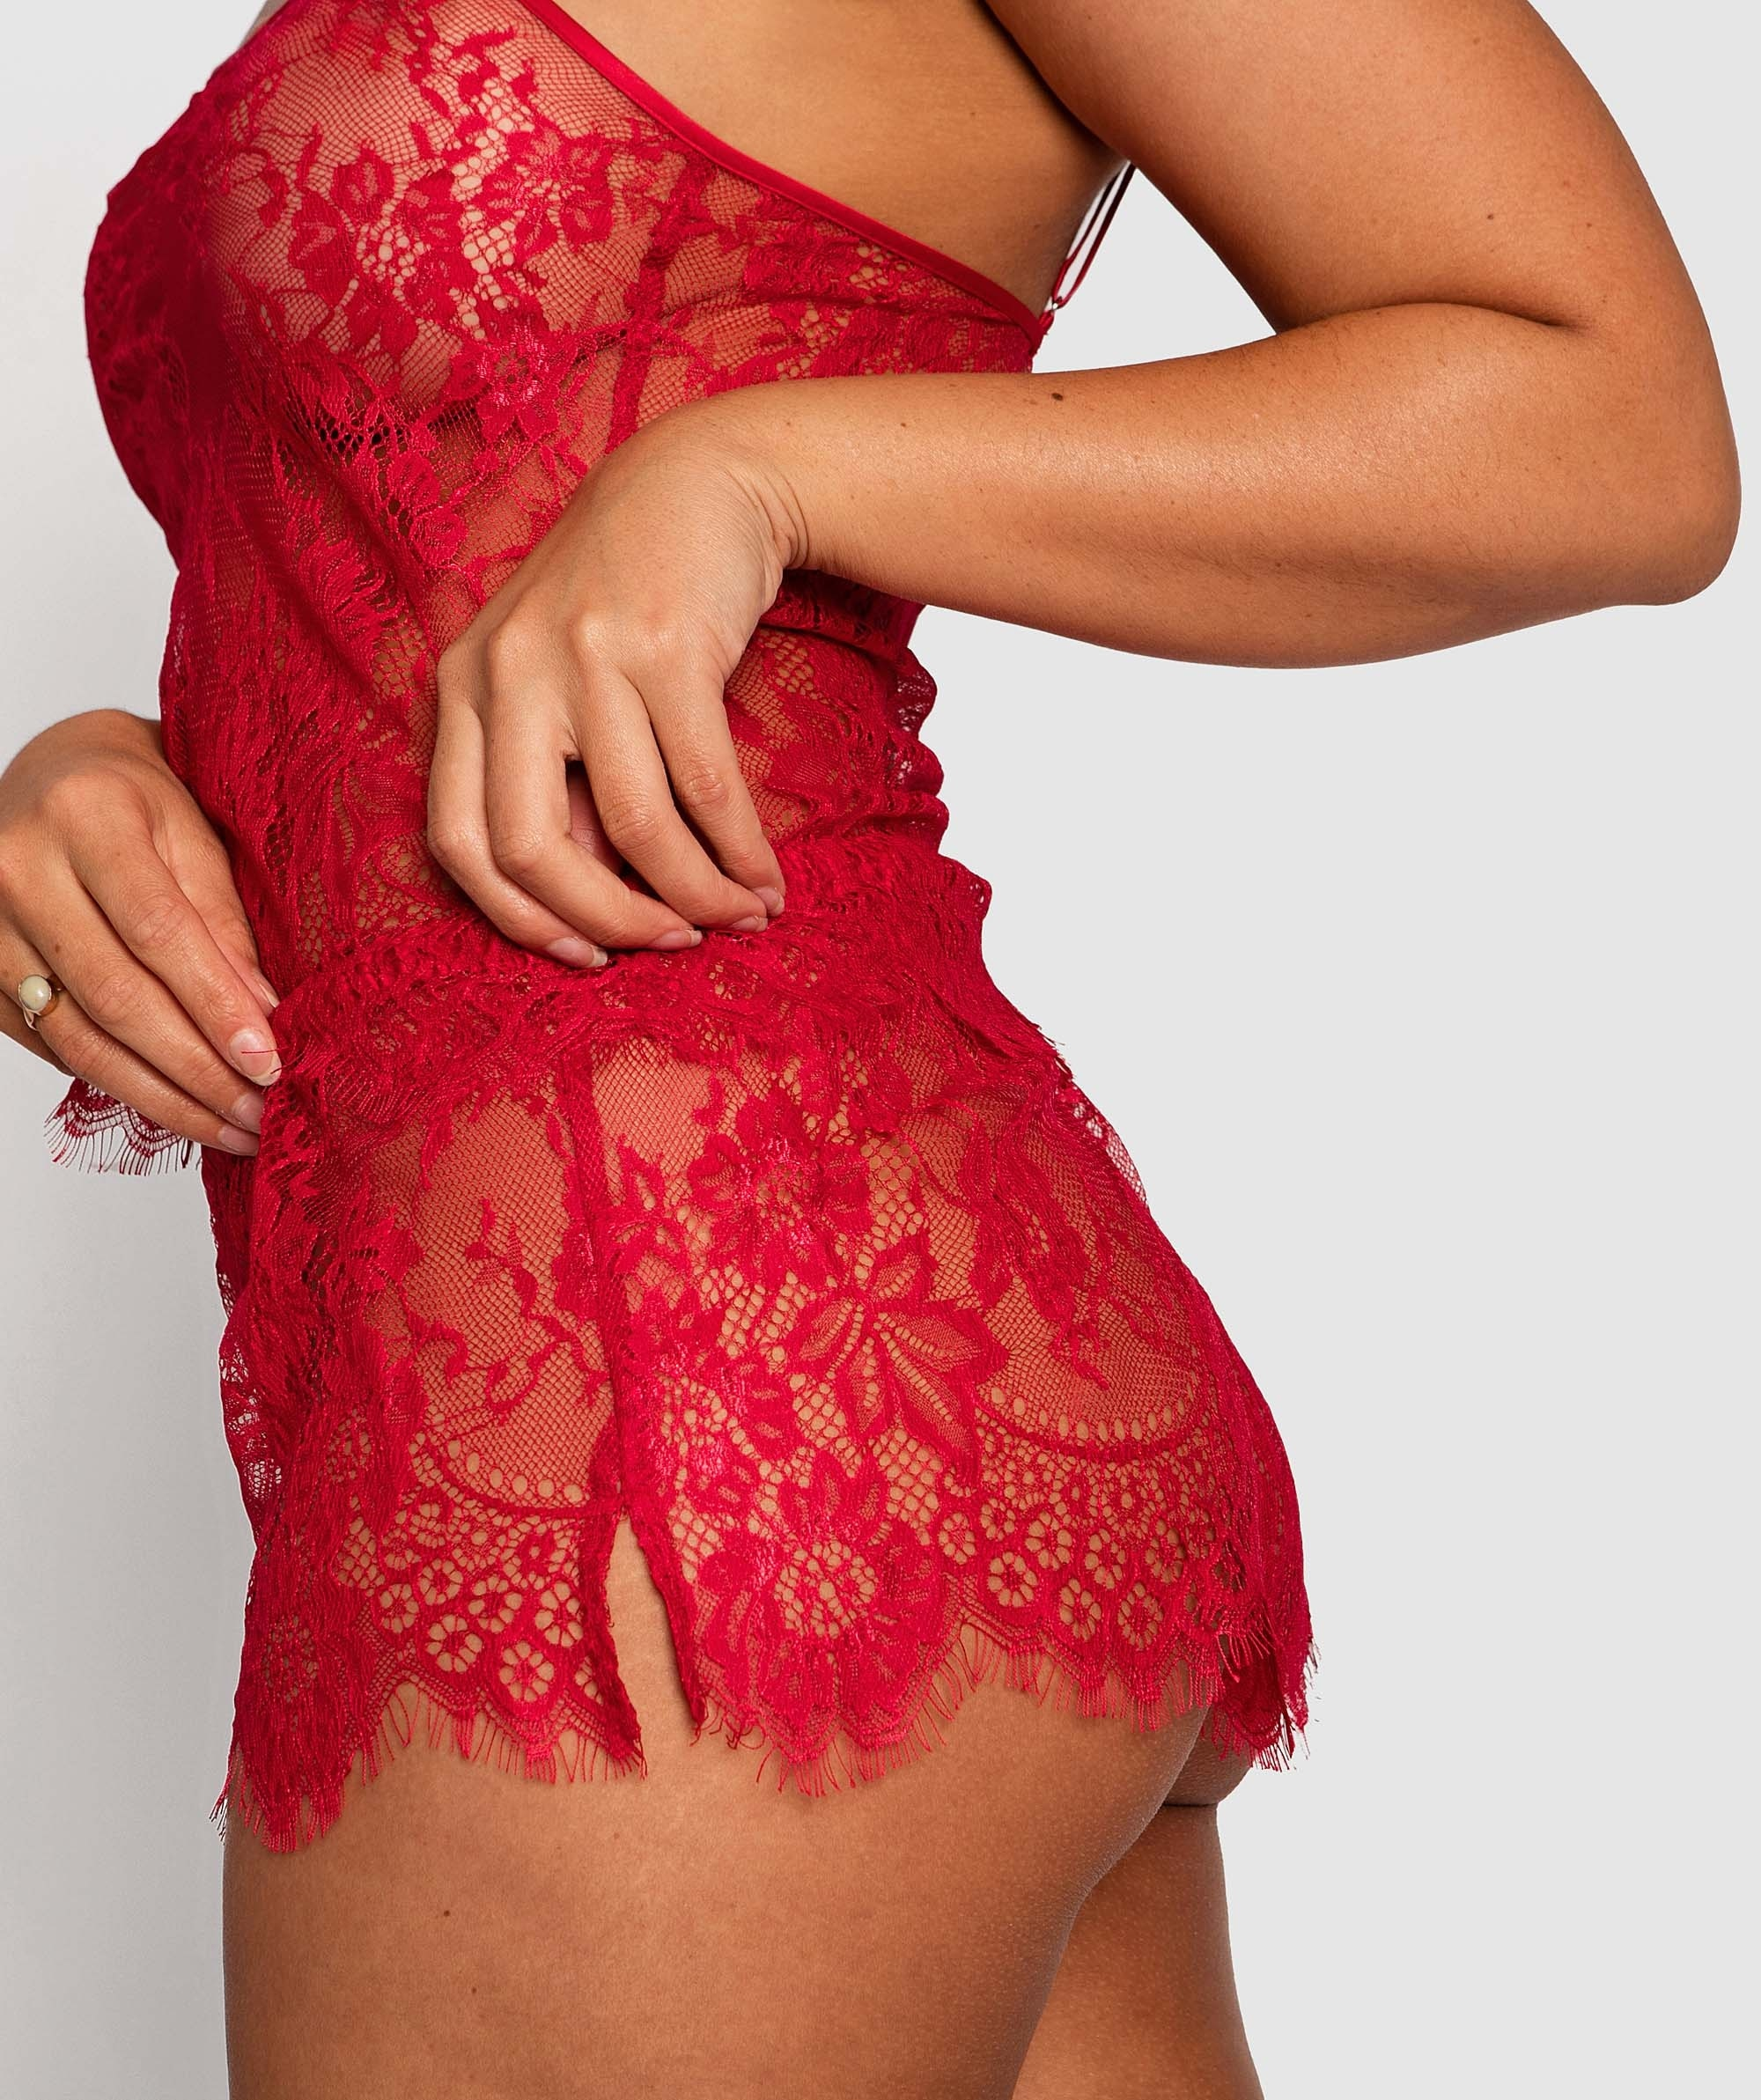 Gabriela French Knicker - Red